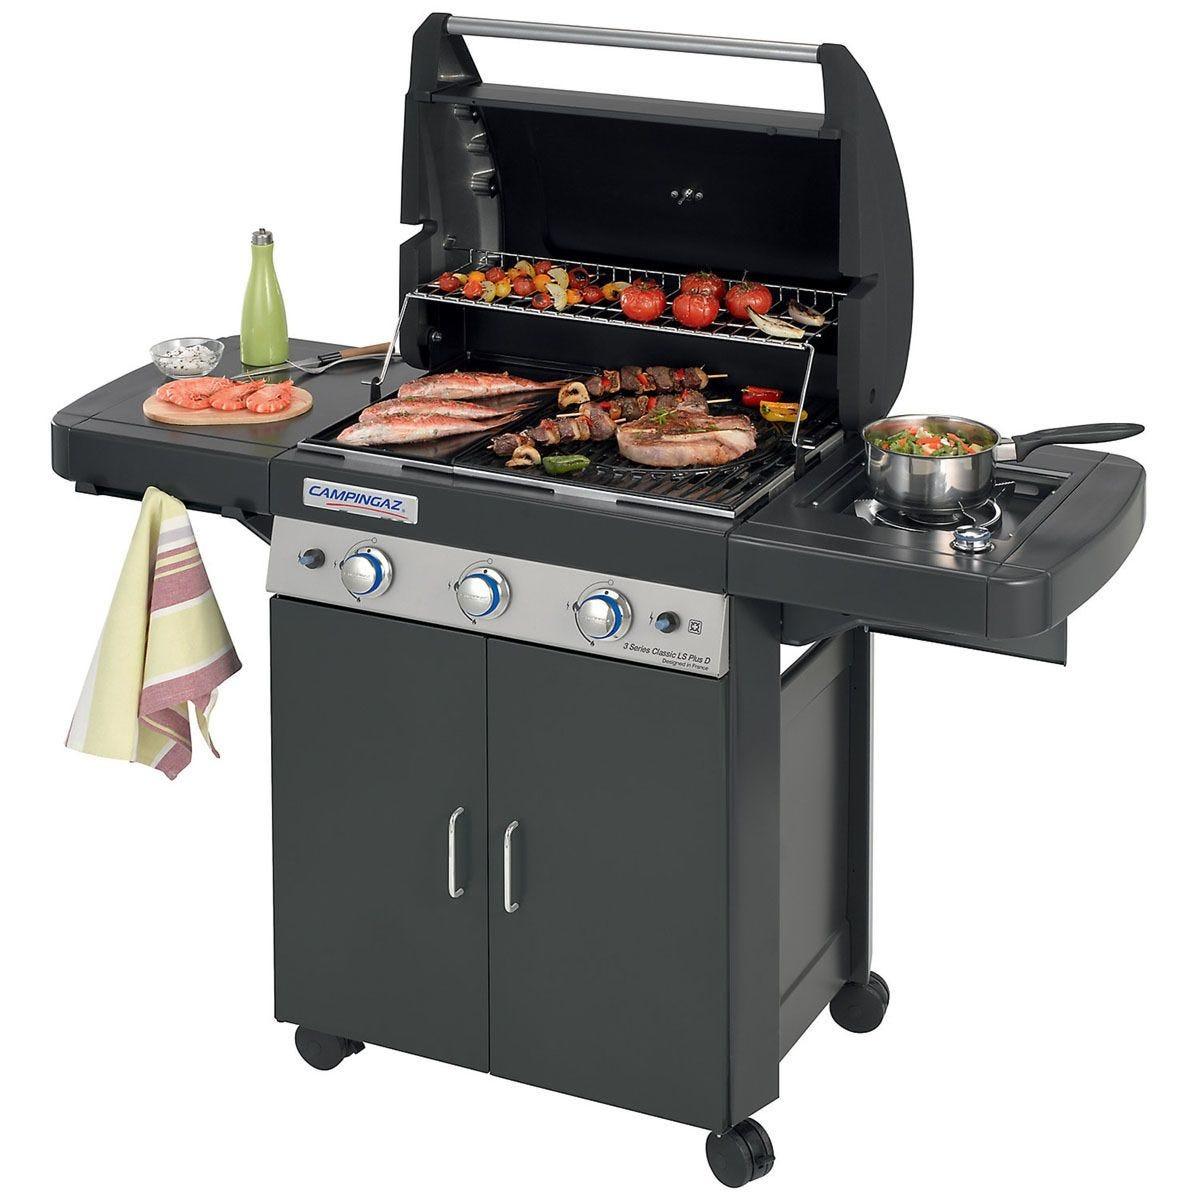 Campingaz 3 Series Classic Ls Plus Gas BBQ - Black